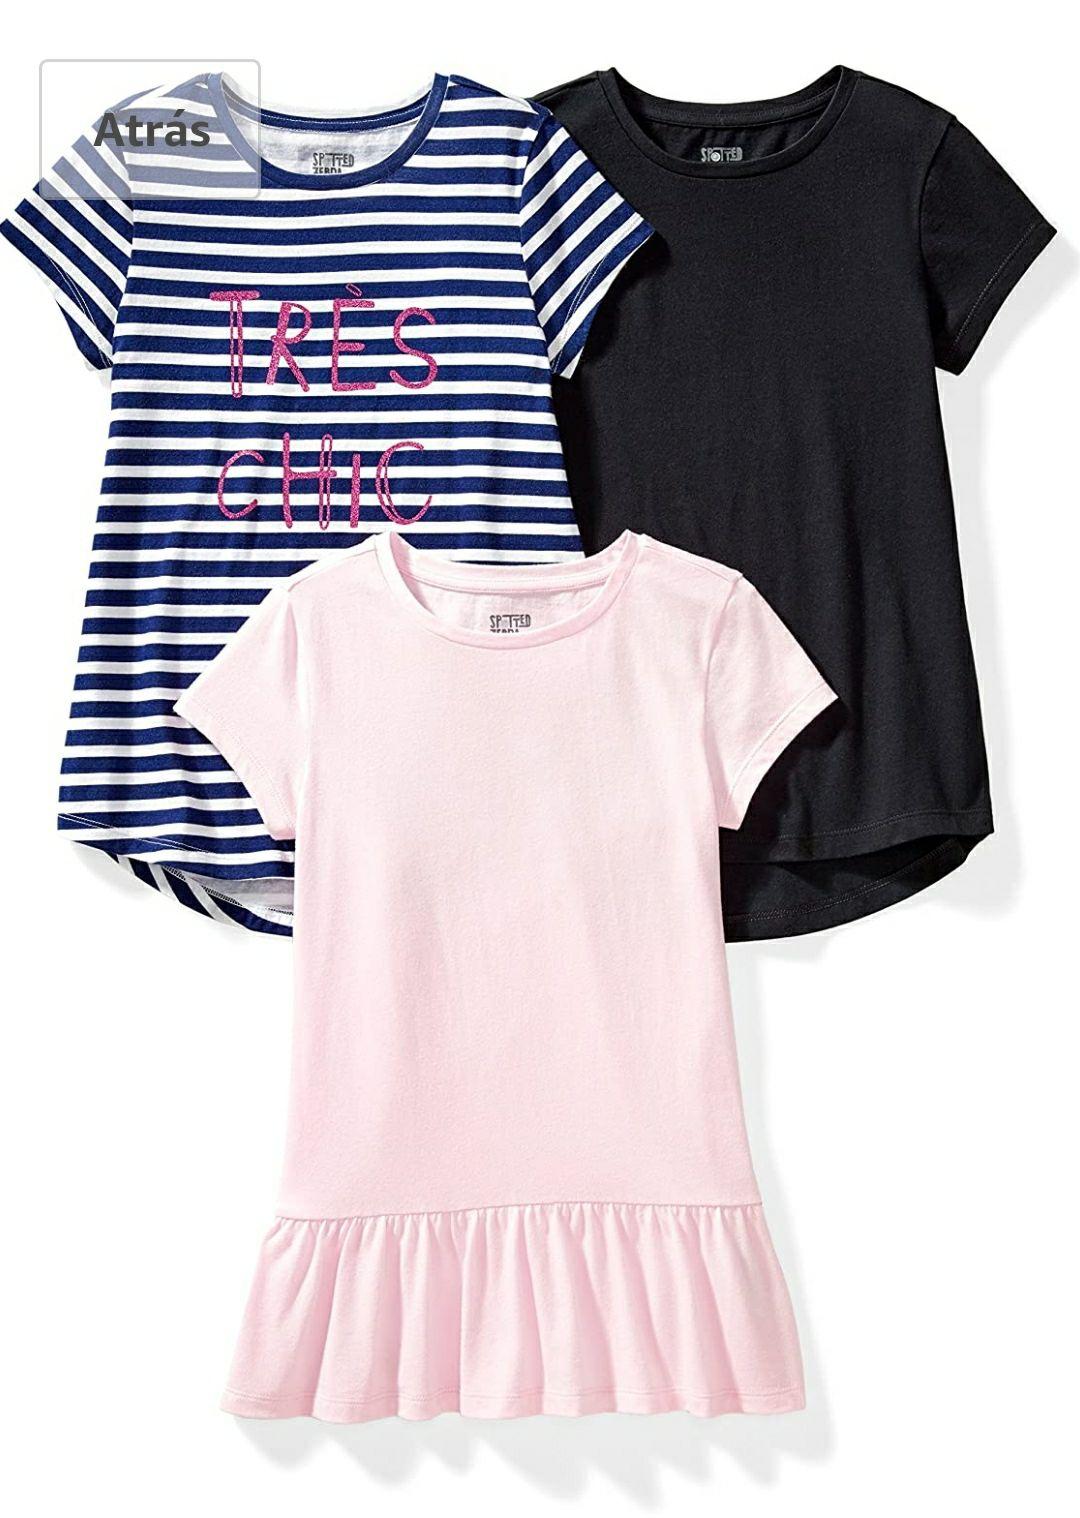 TALLA 116cm - Spotted Zebra Short-Sleeve Tunic T-Shirts Niñas, Pack de 3